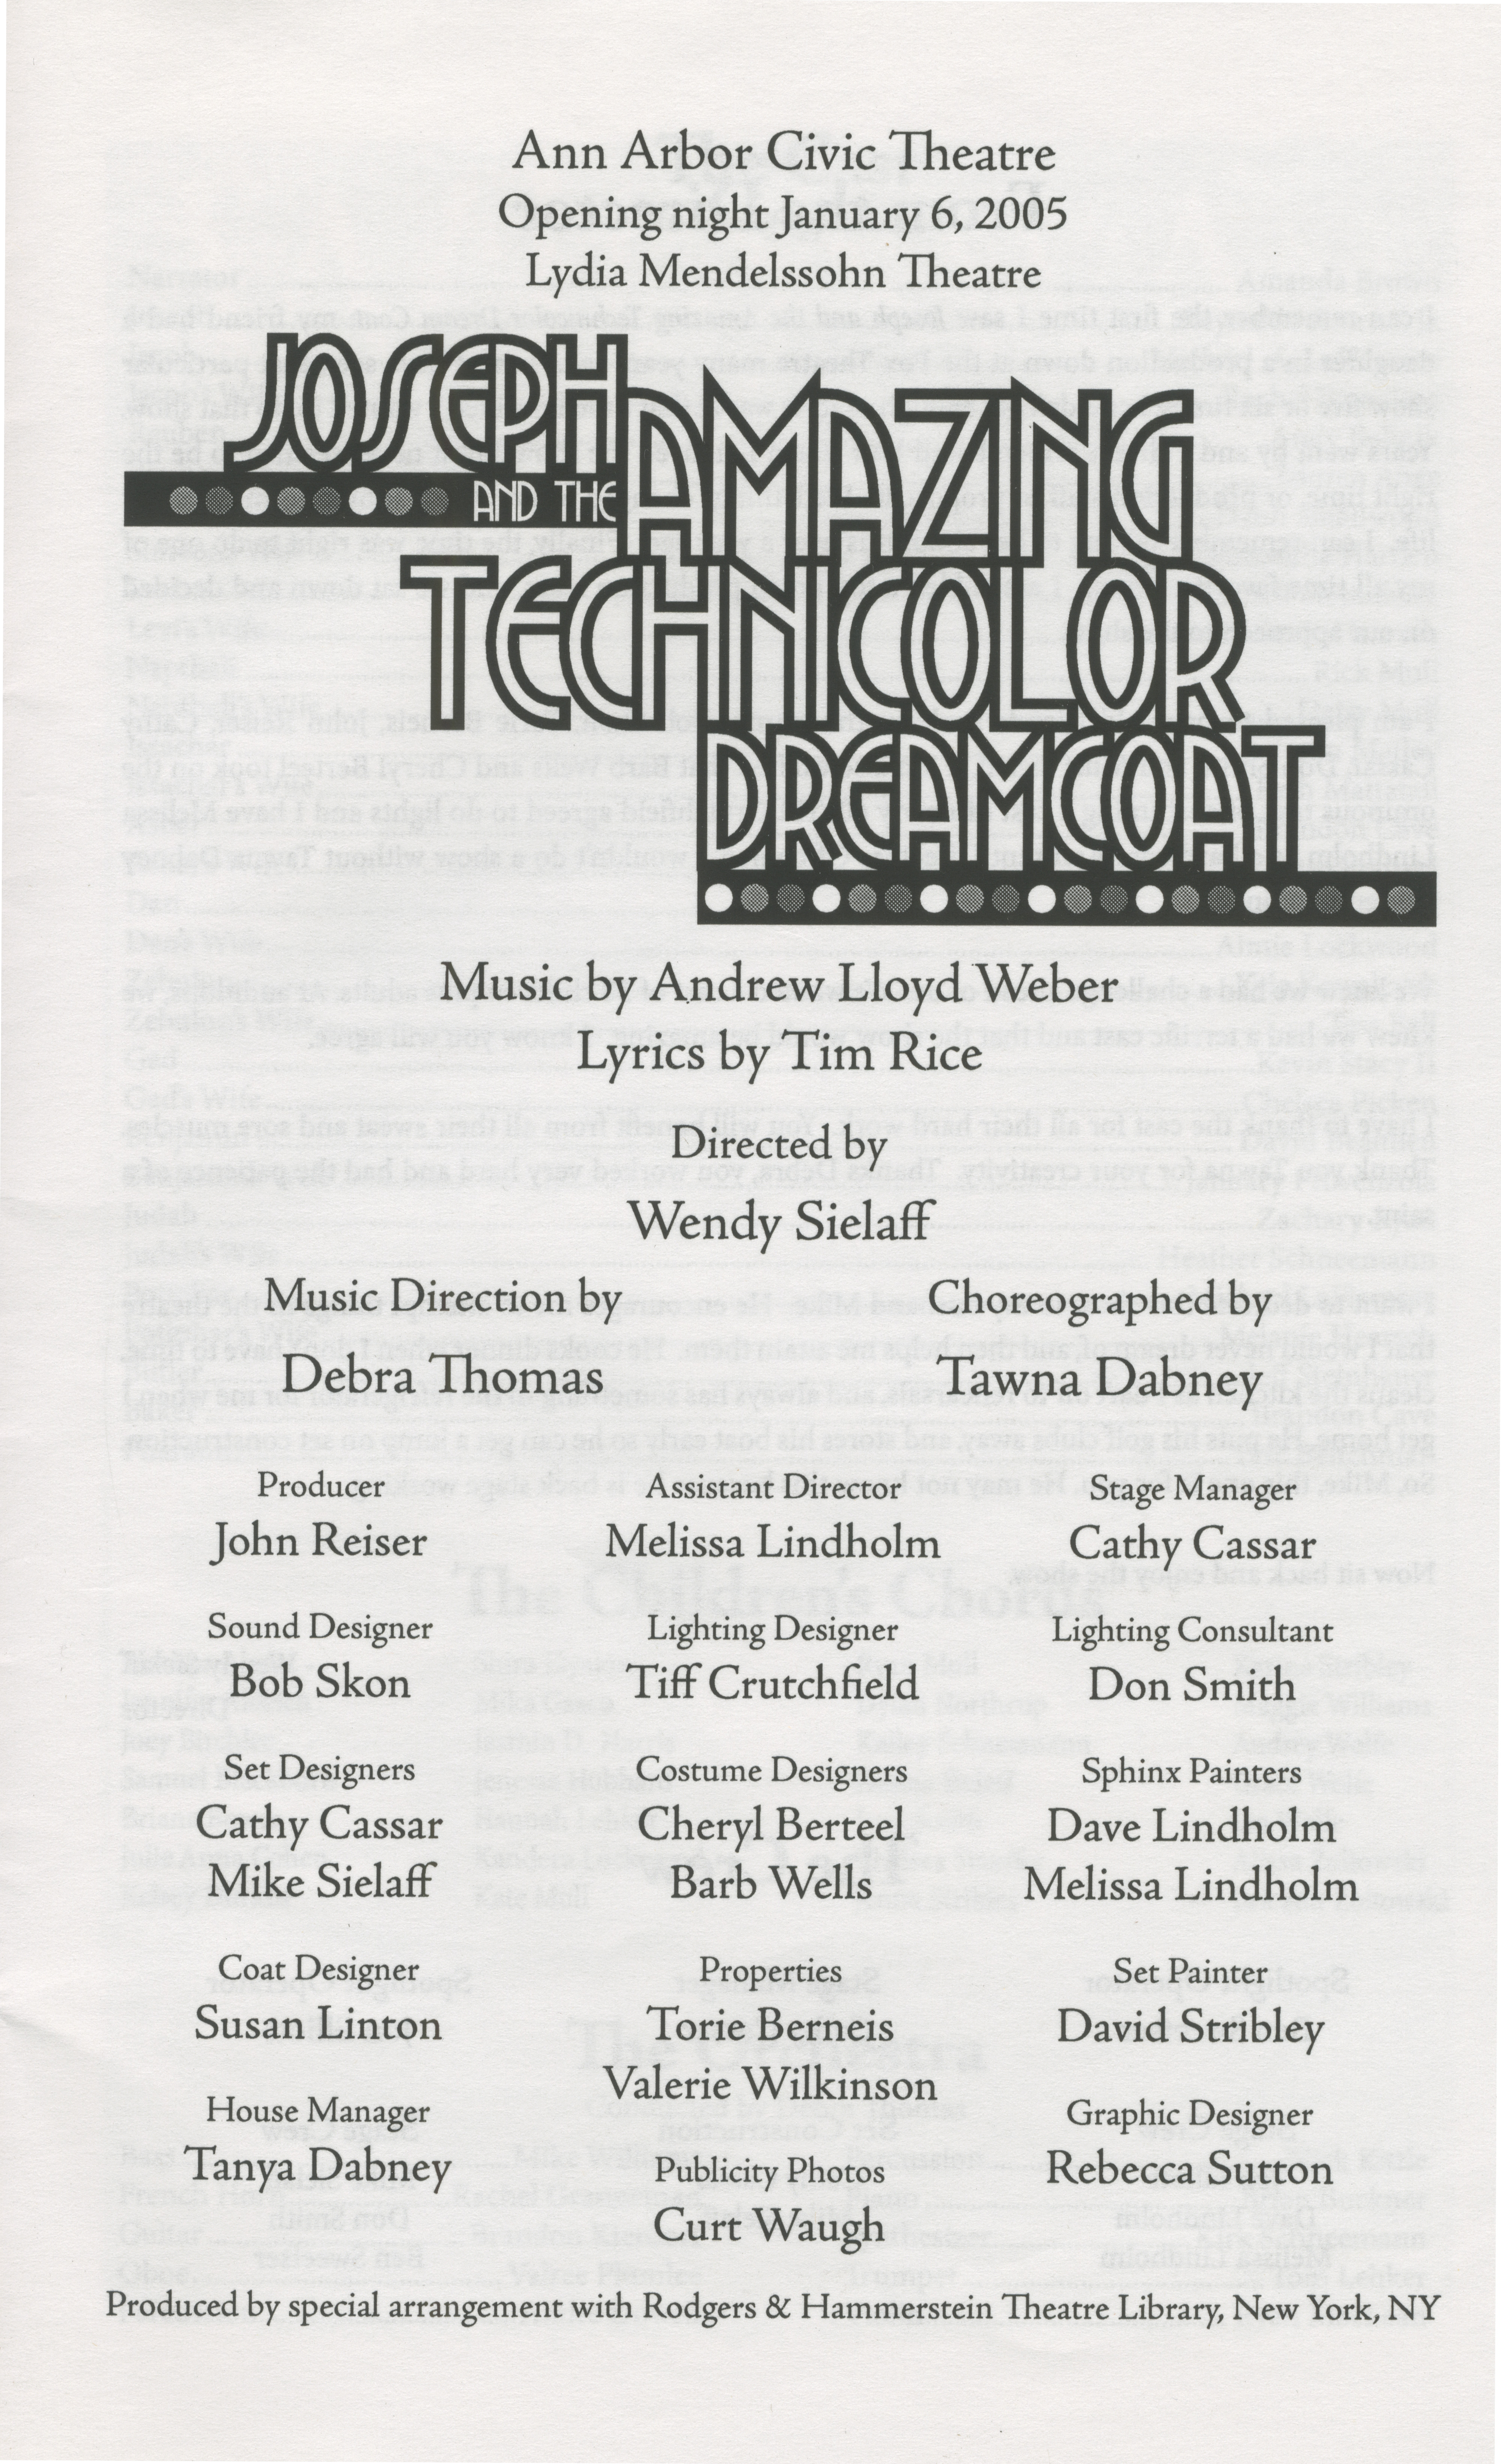 ann arbor civic theatre program  joseph and the amazing